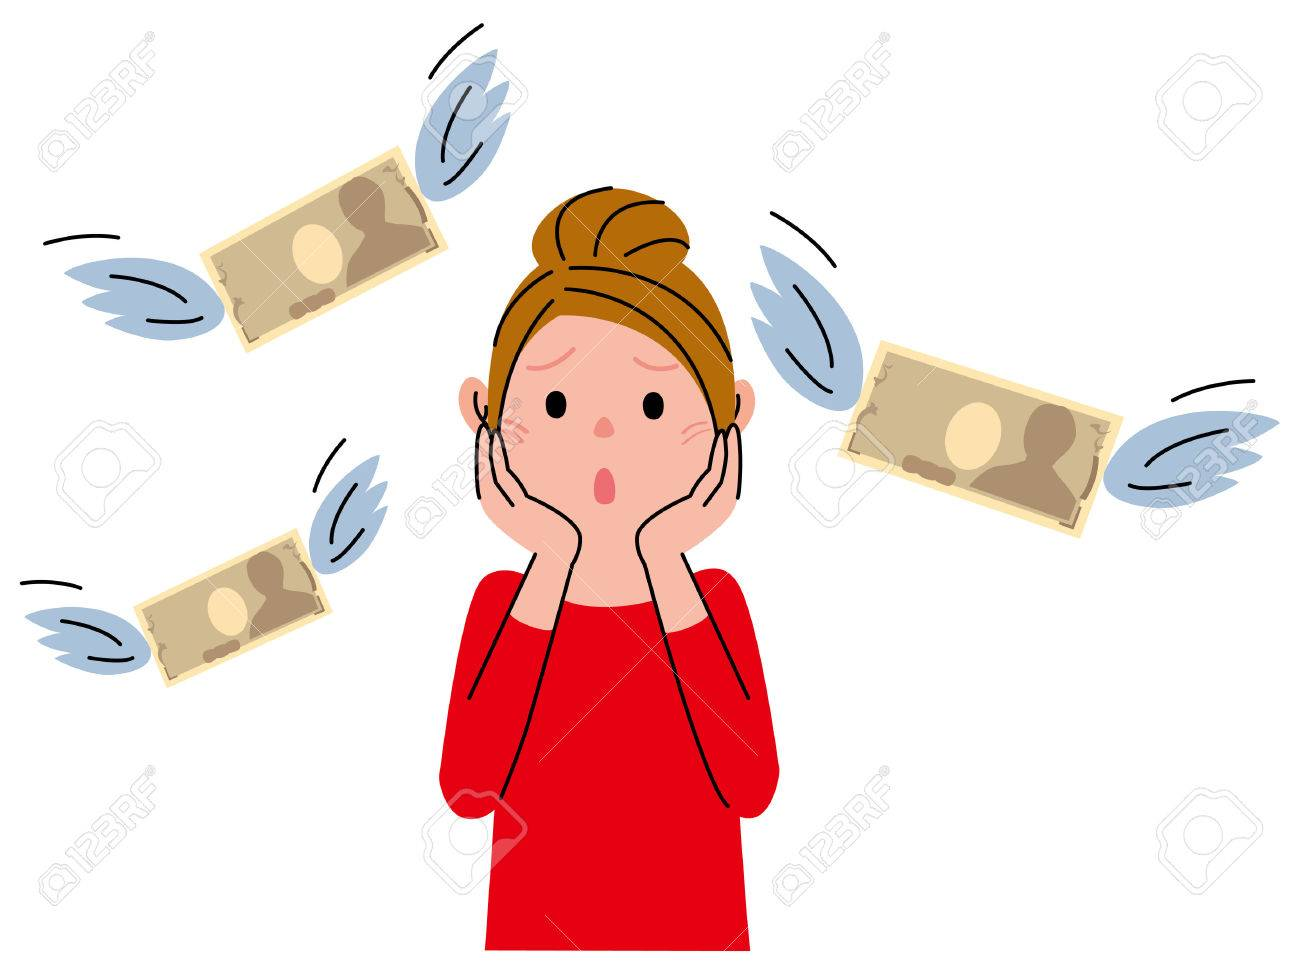 Woman Money - 48064568